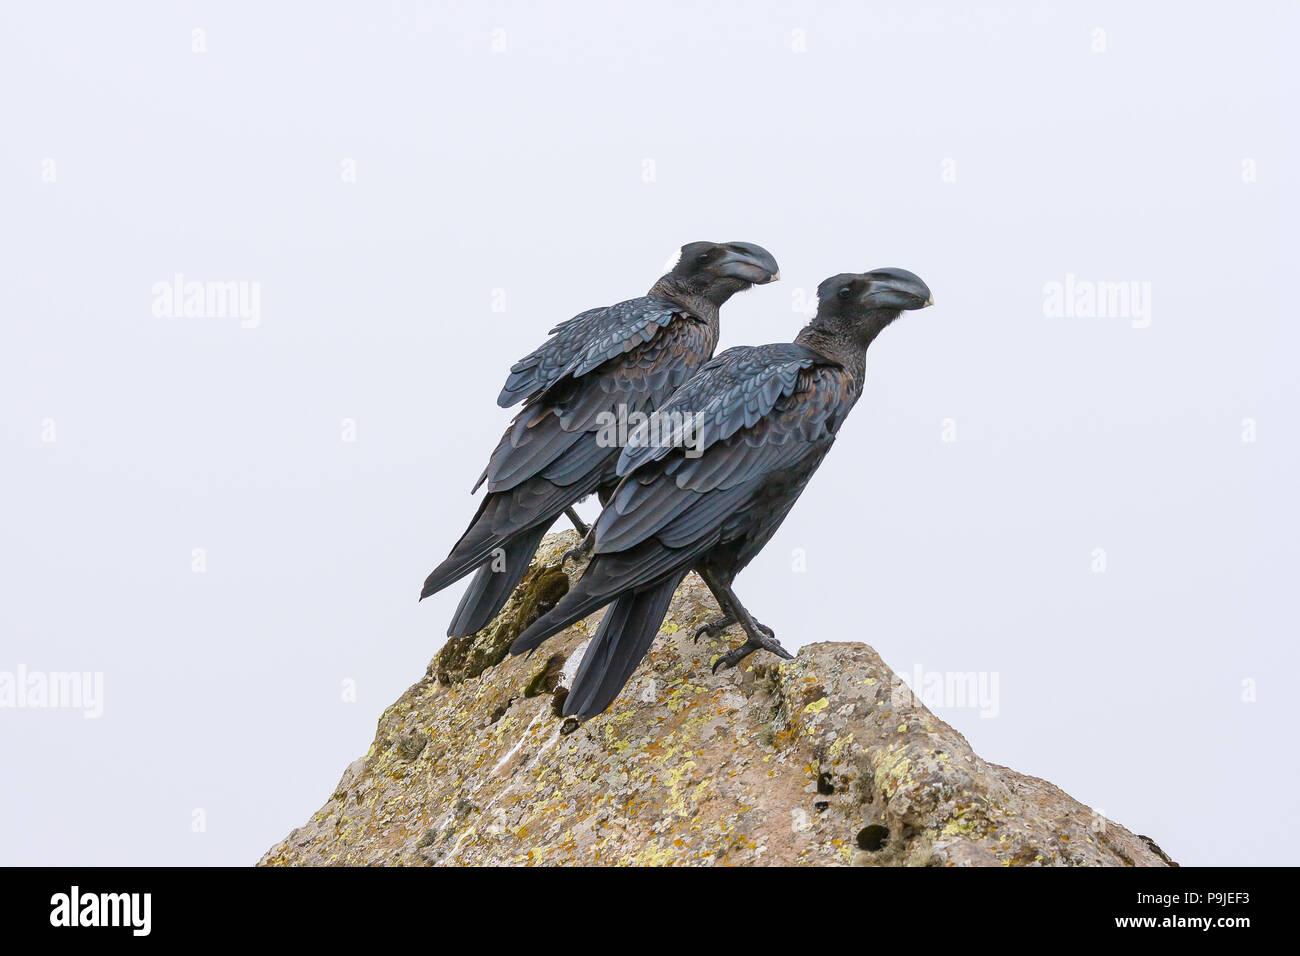 Thick-Billed Raven (Corvus crassirostris), Simien Mountains, Ethiopia. - Stock Image